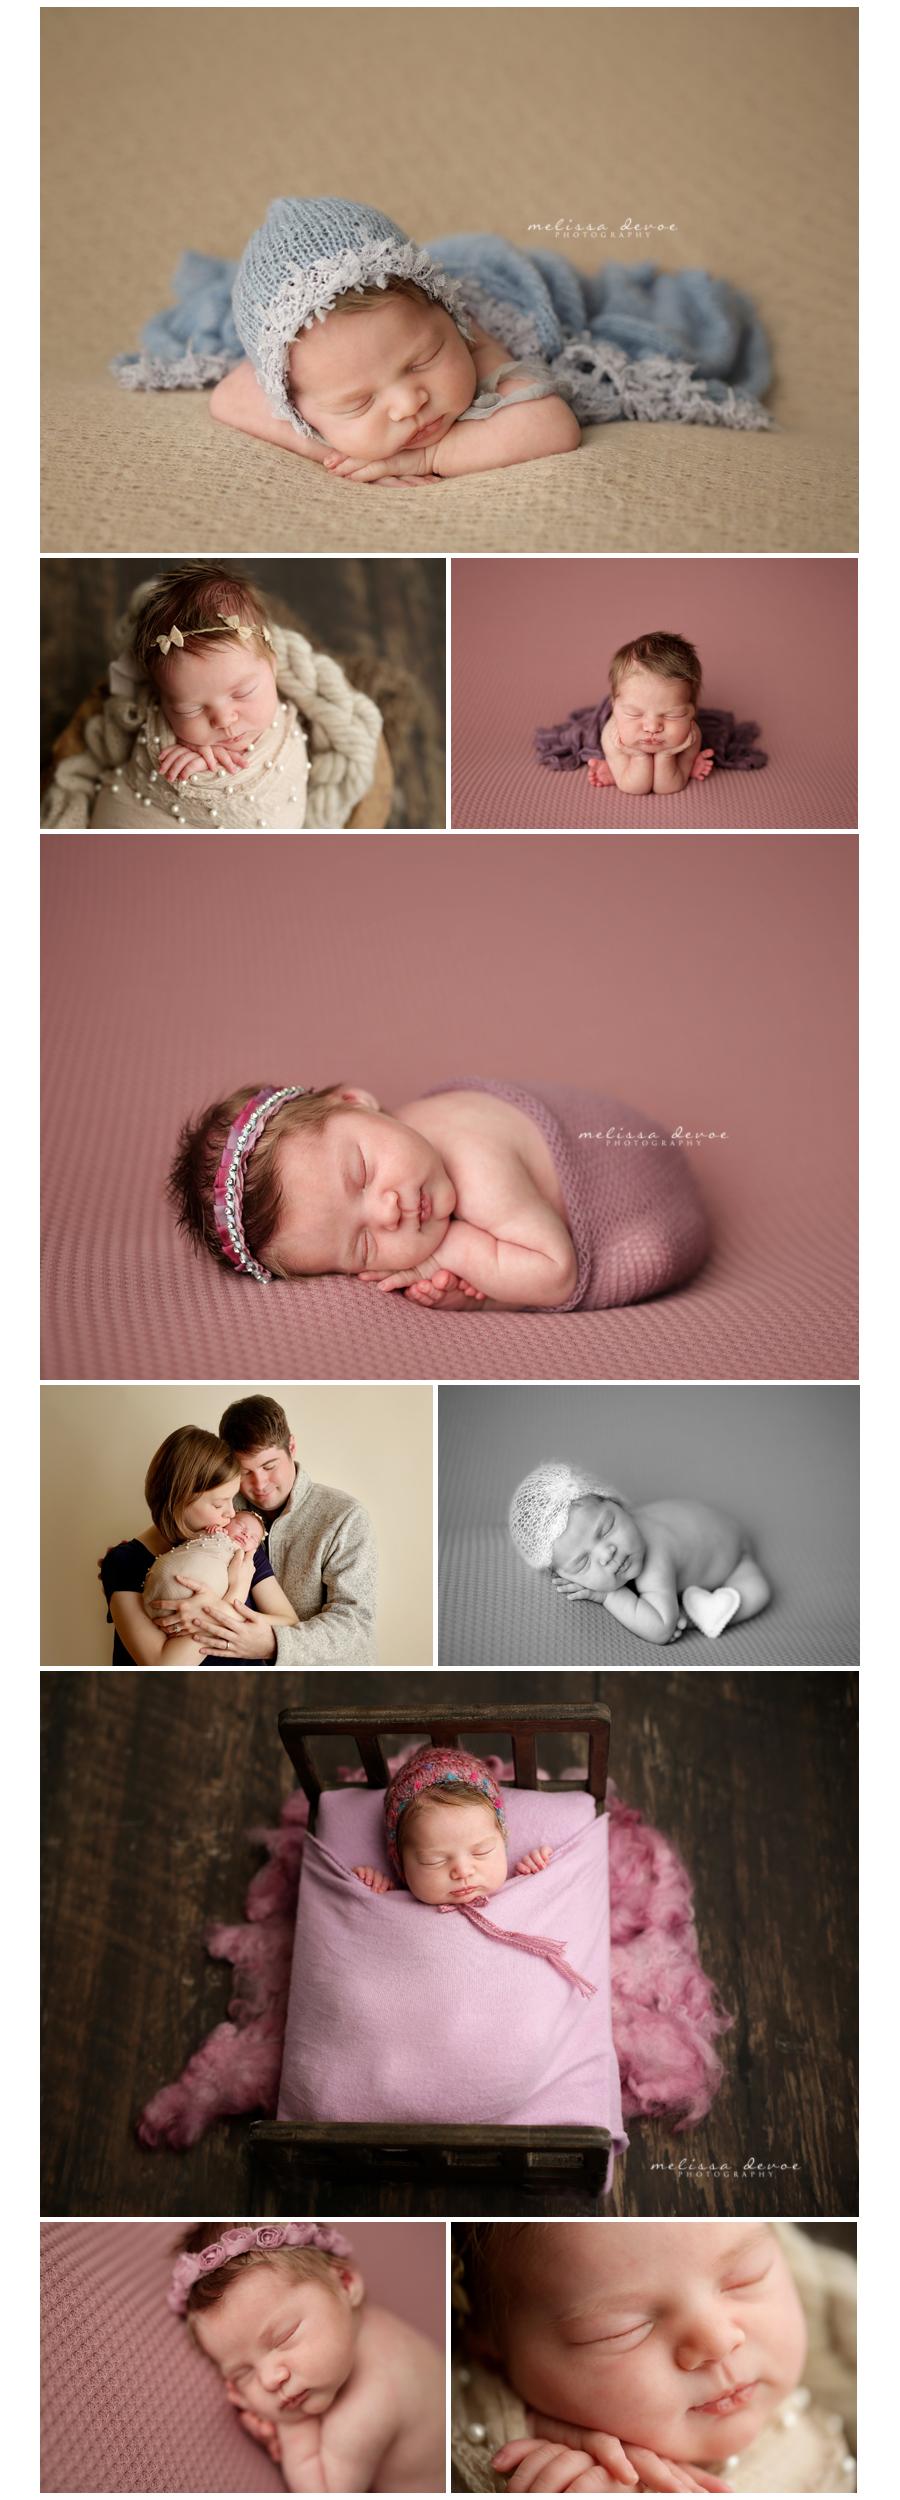 Best Baby Photographer Raleigh NC